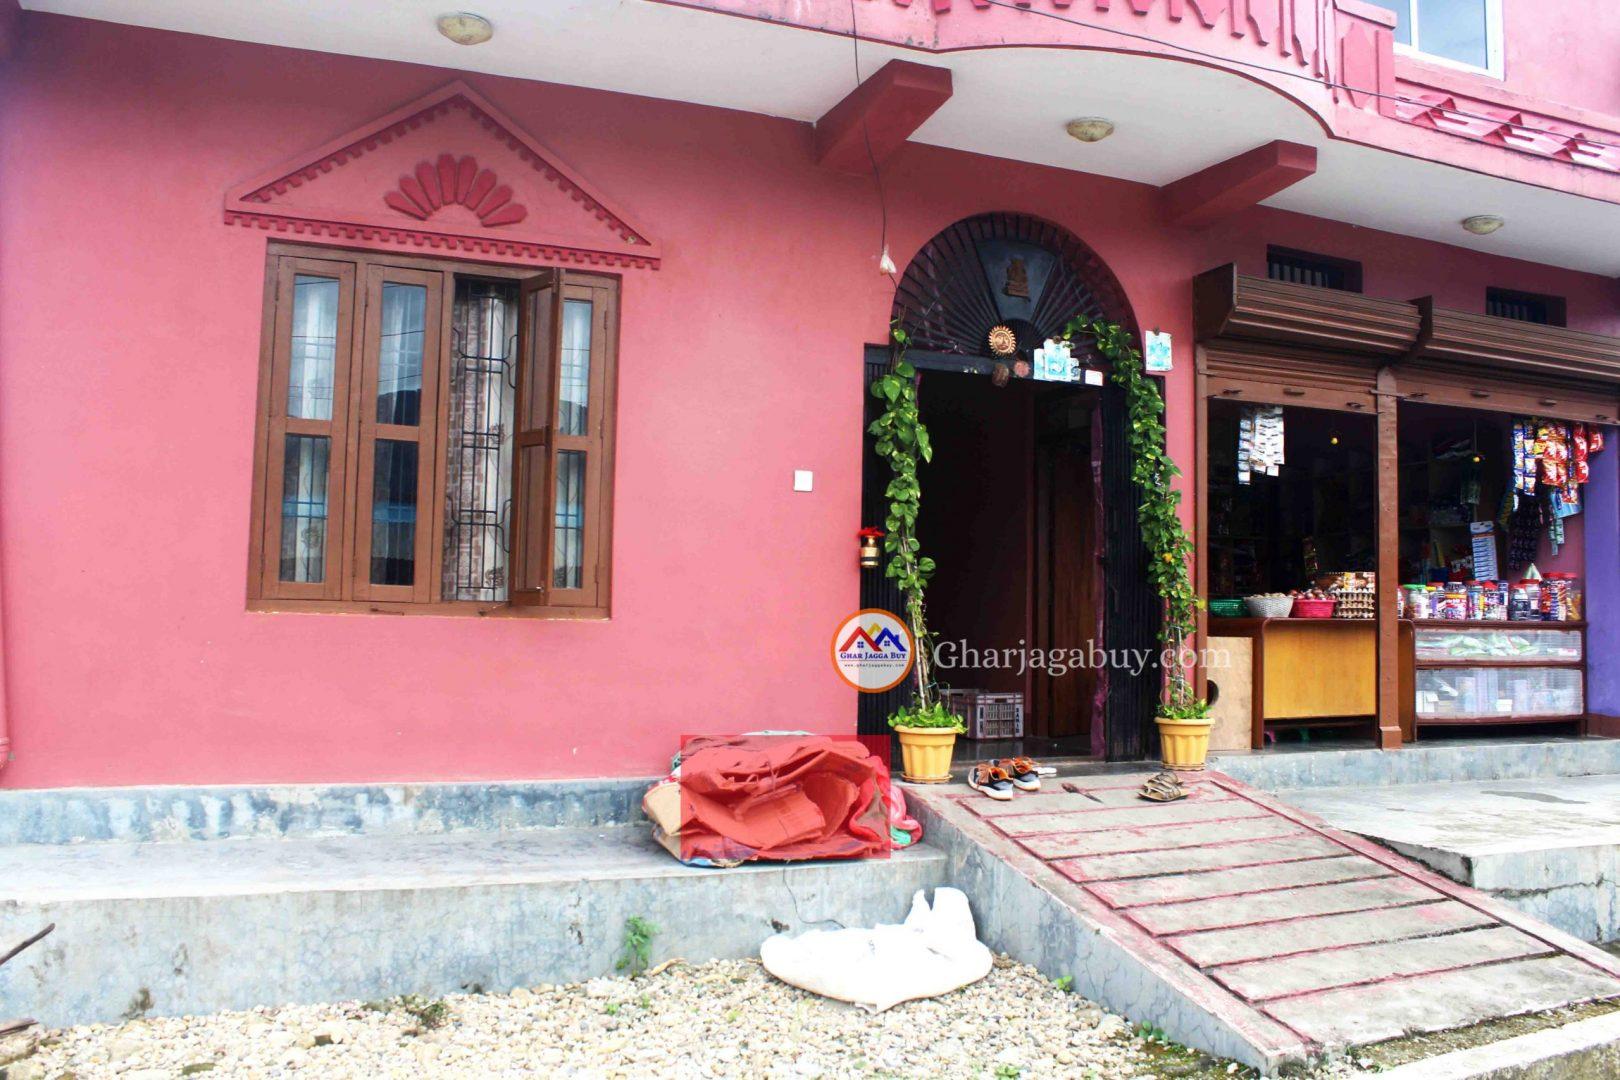 House for sale near Butwal, Charange, Rupandehi Nepal